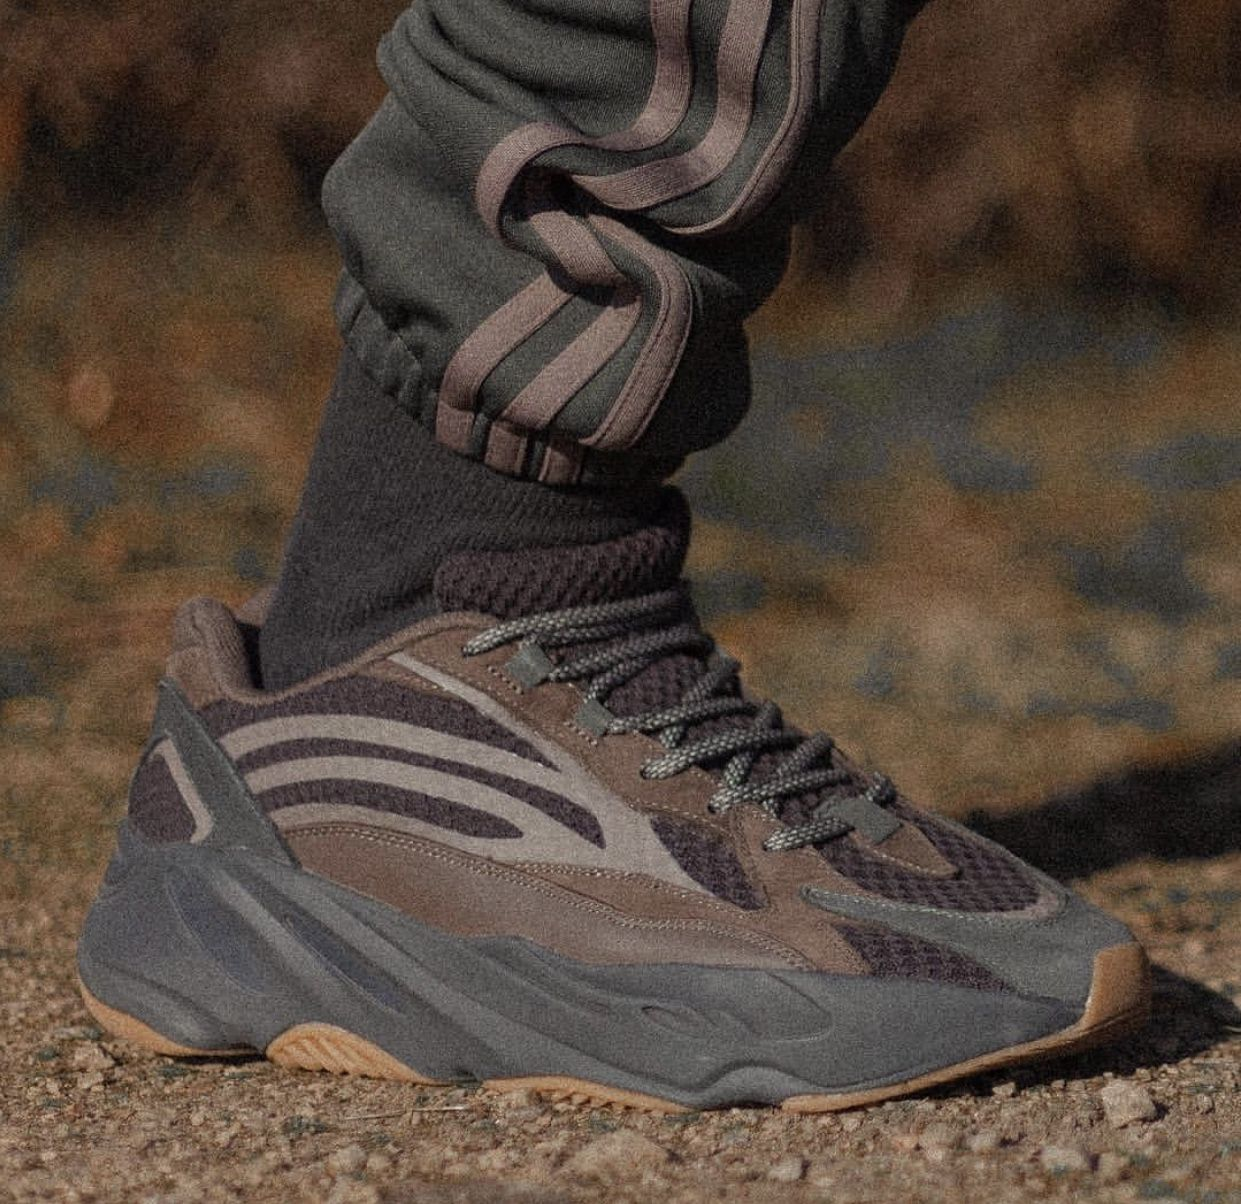 Yeezy Boost 700 v2 Geode Adidas | Calabasas pants, Adidas ...